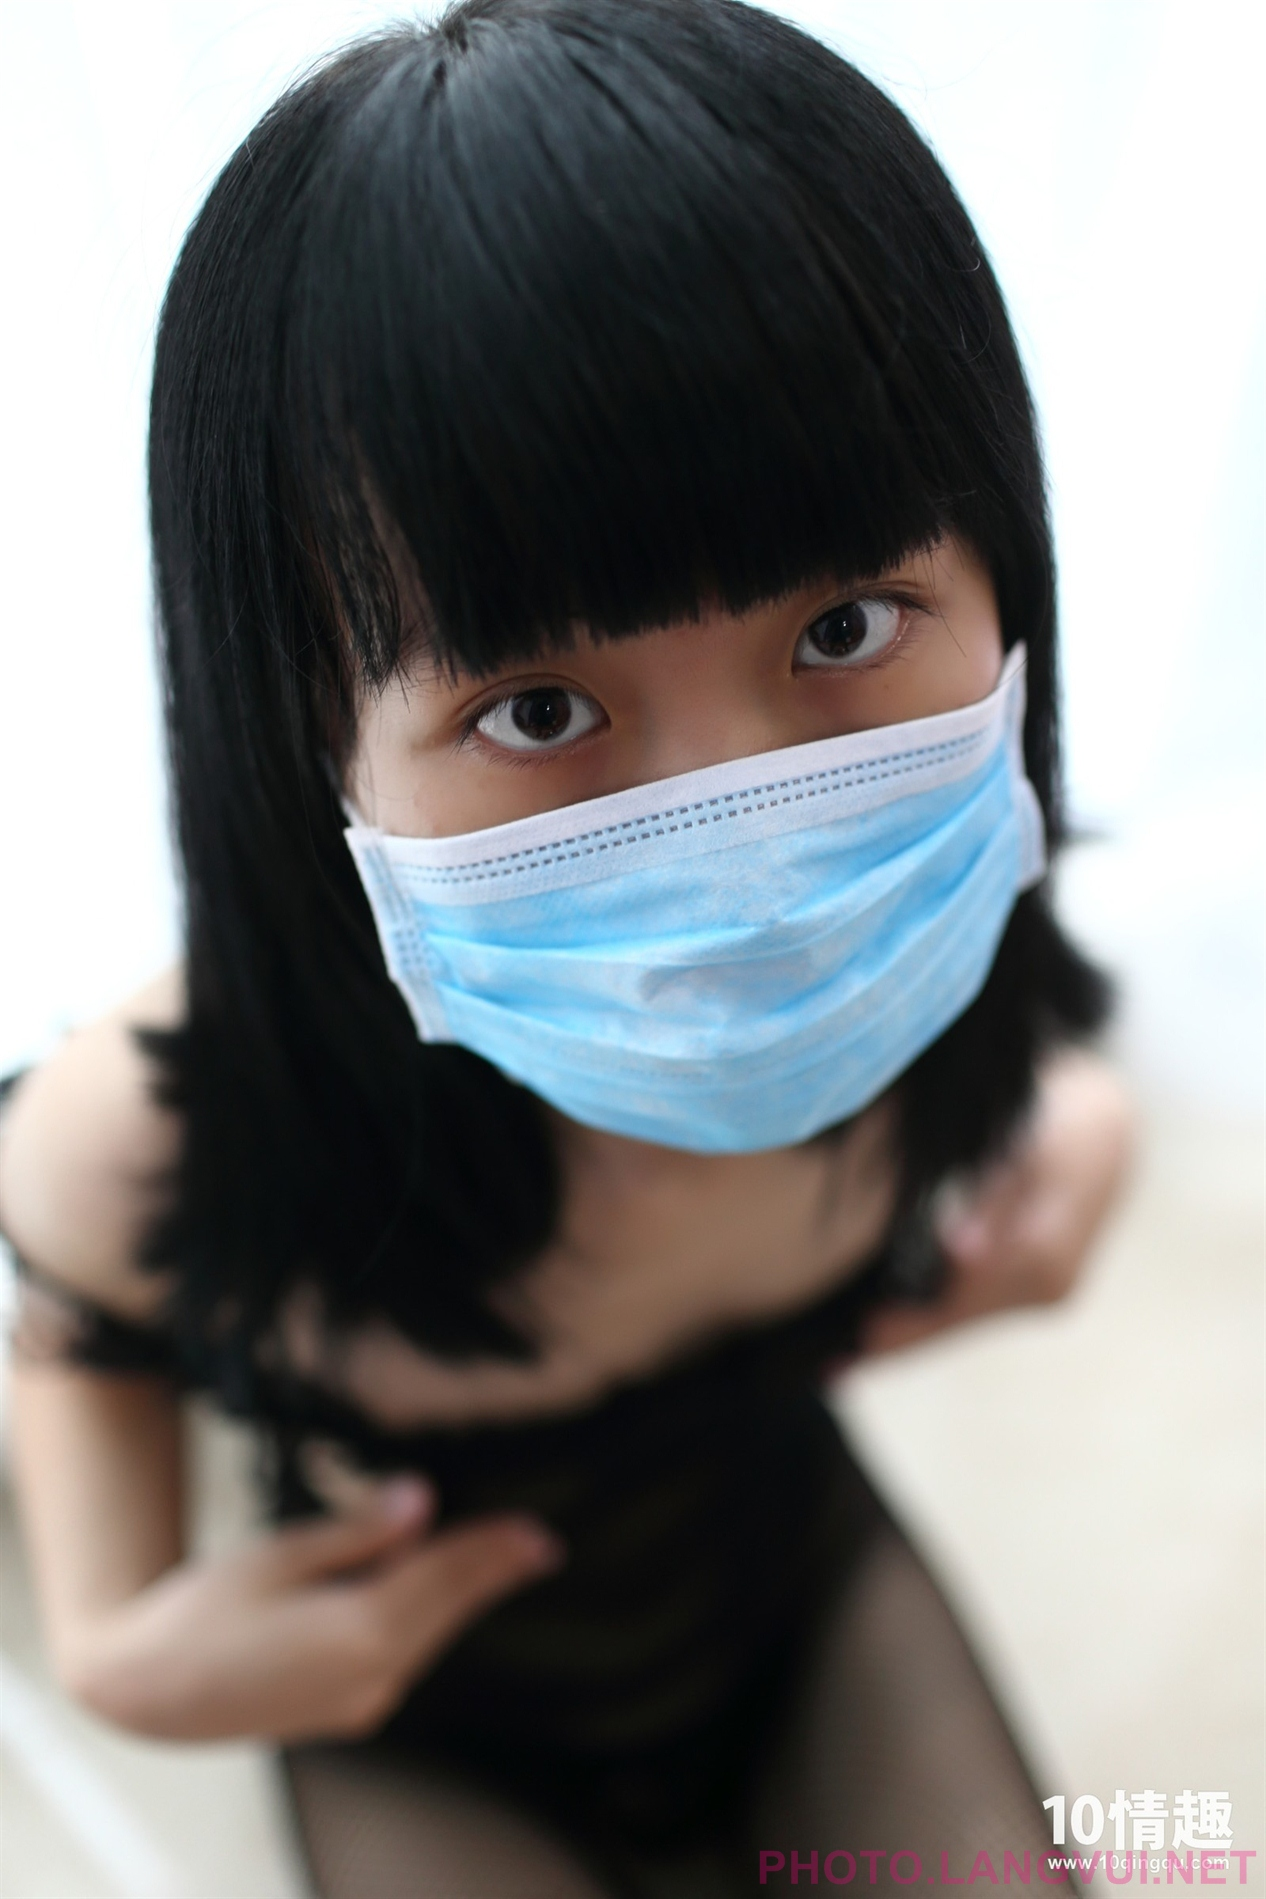 10QingQu Mask Series No 144